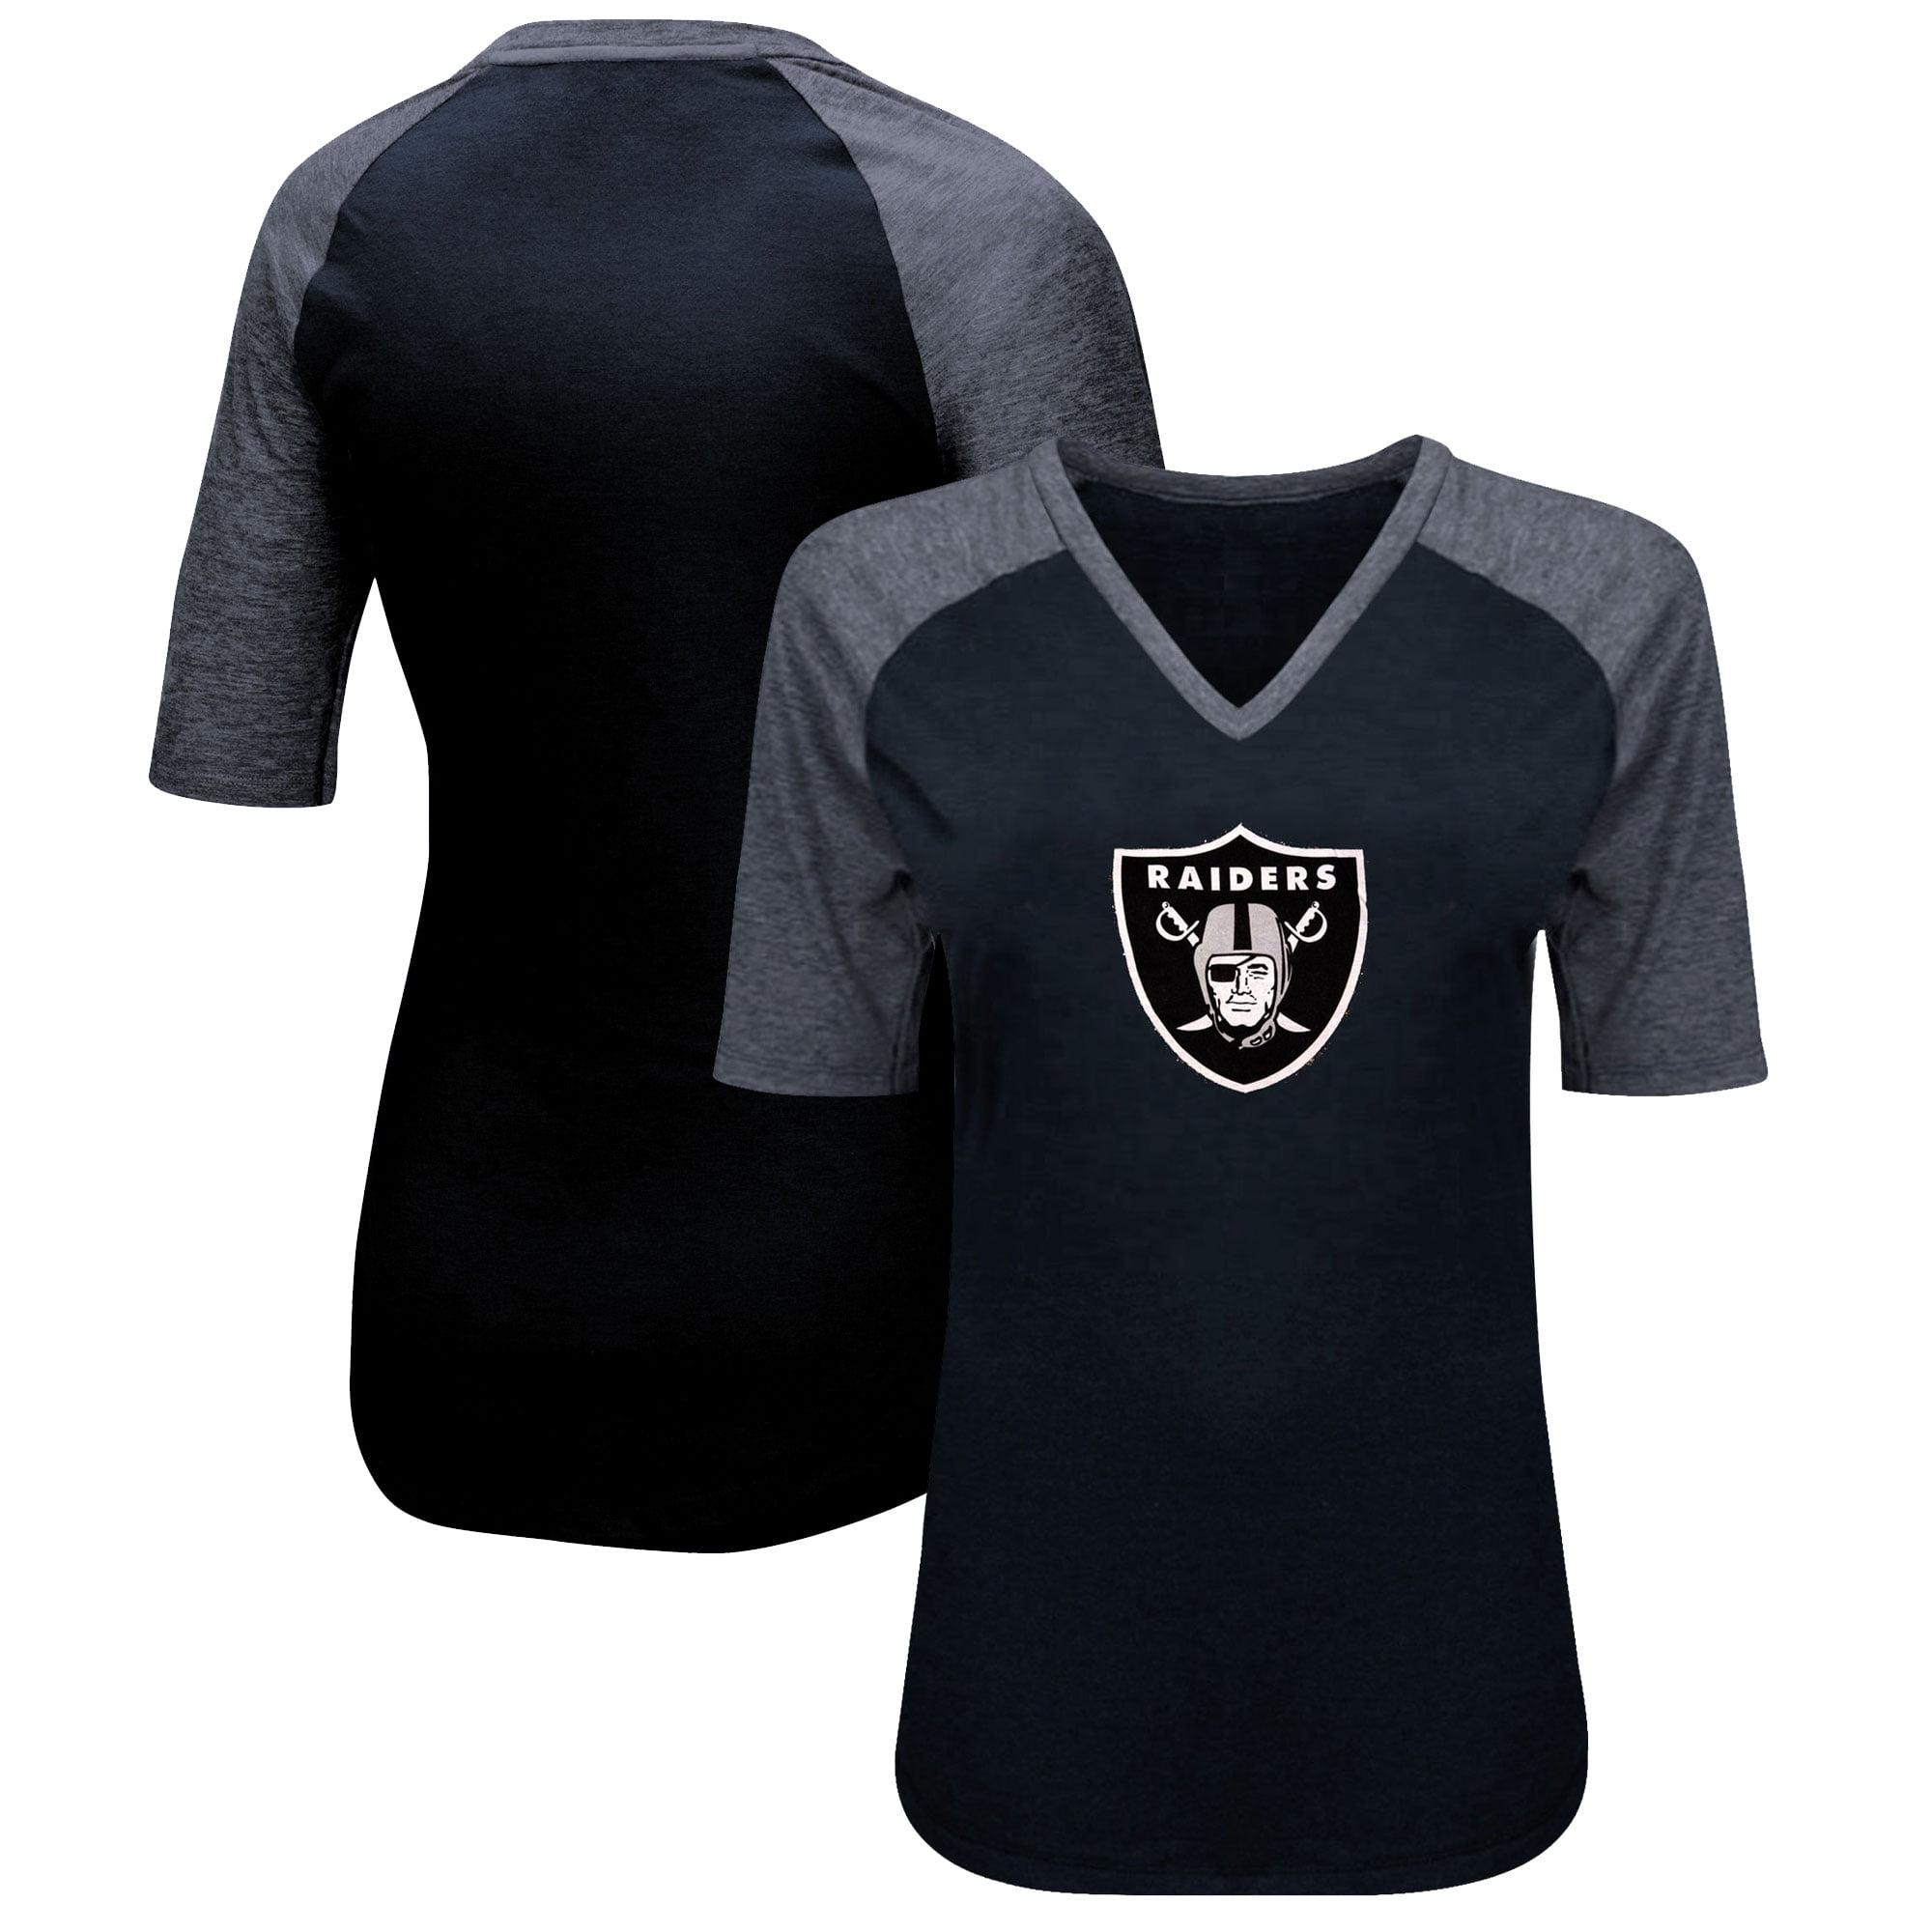 Oakland Raiders Majestic Women's Highlight Play Half Sleeve Raglan Plus Size T-Shirt - Black/Heathered Black